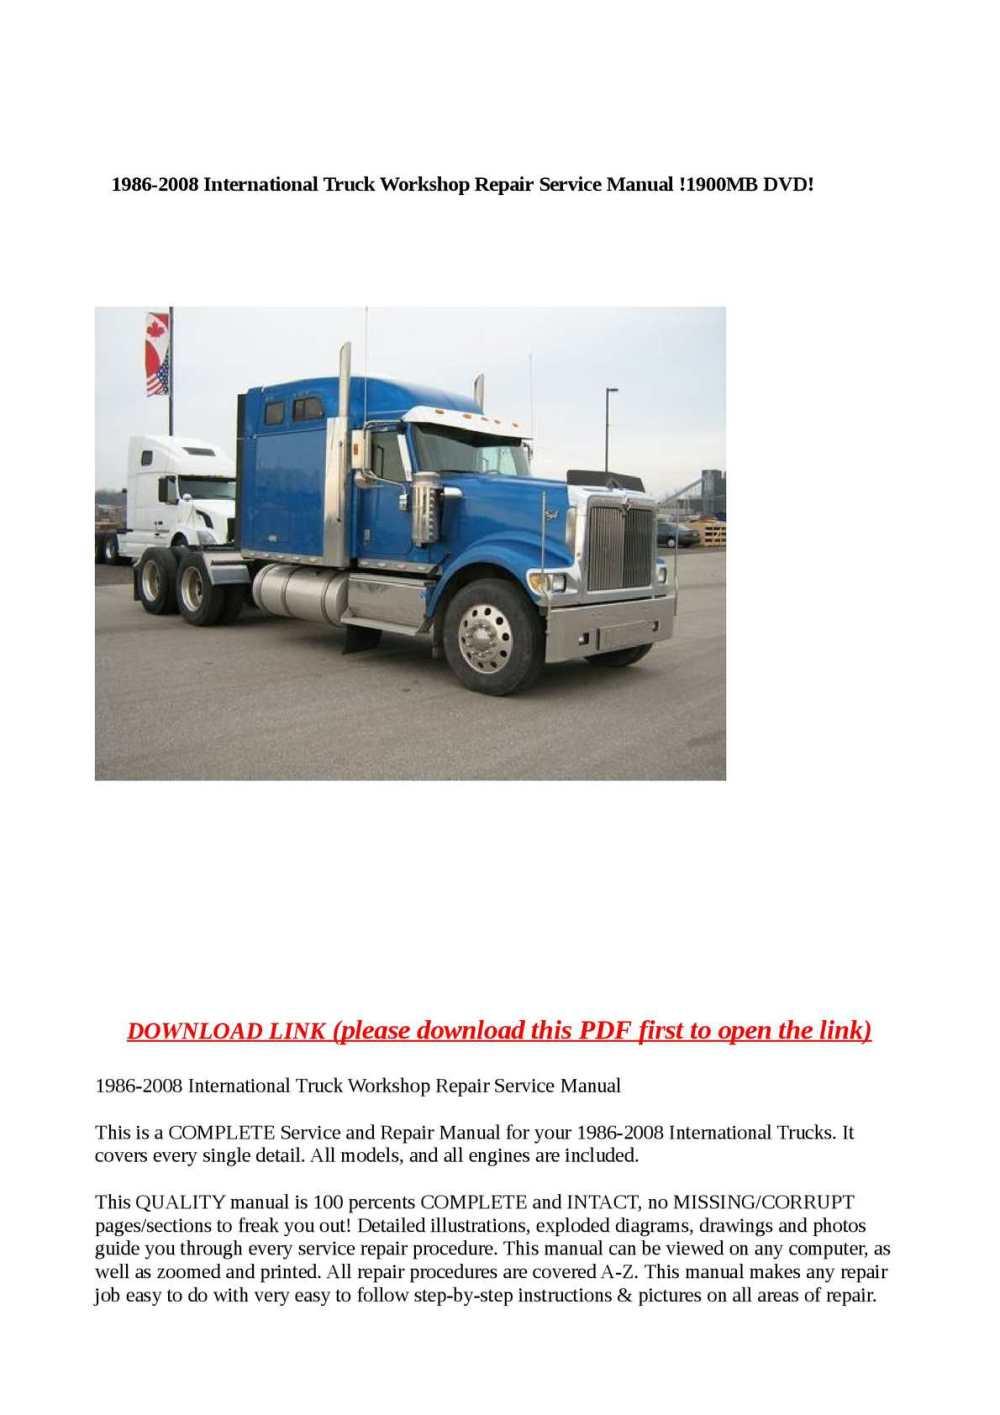 medium resolution of calam o 1986 2008 international truck workshop repair service manual 1900mb dvd